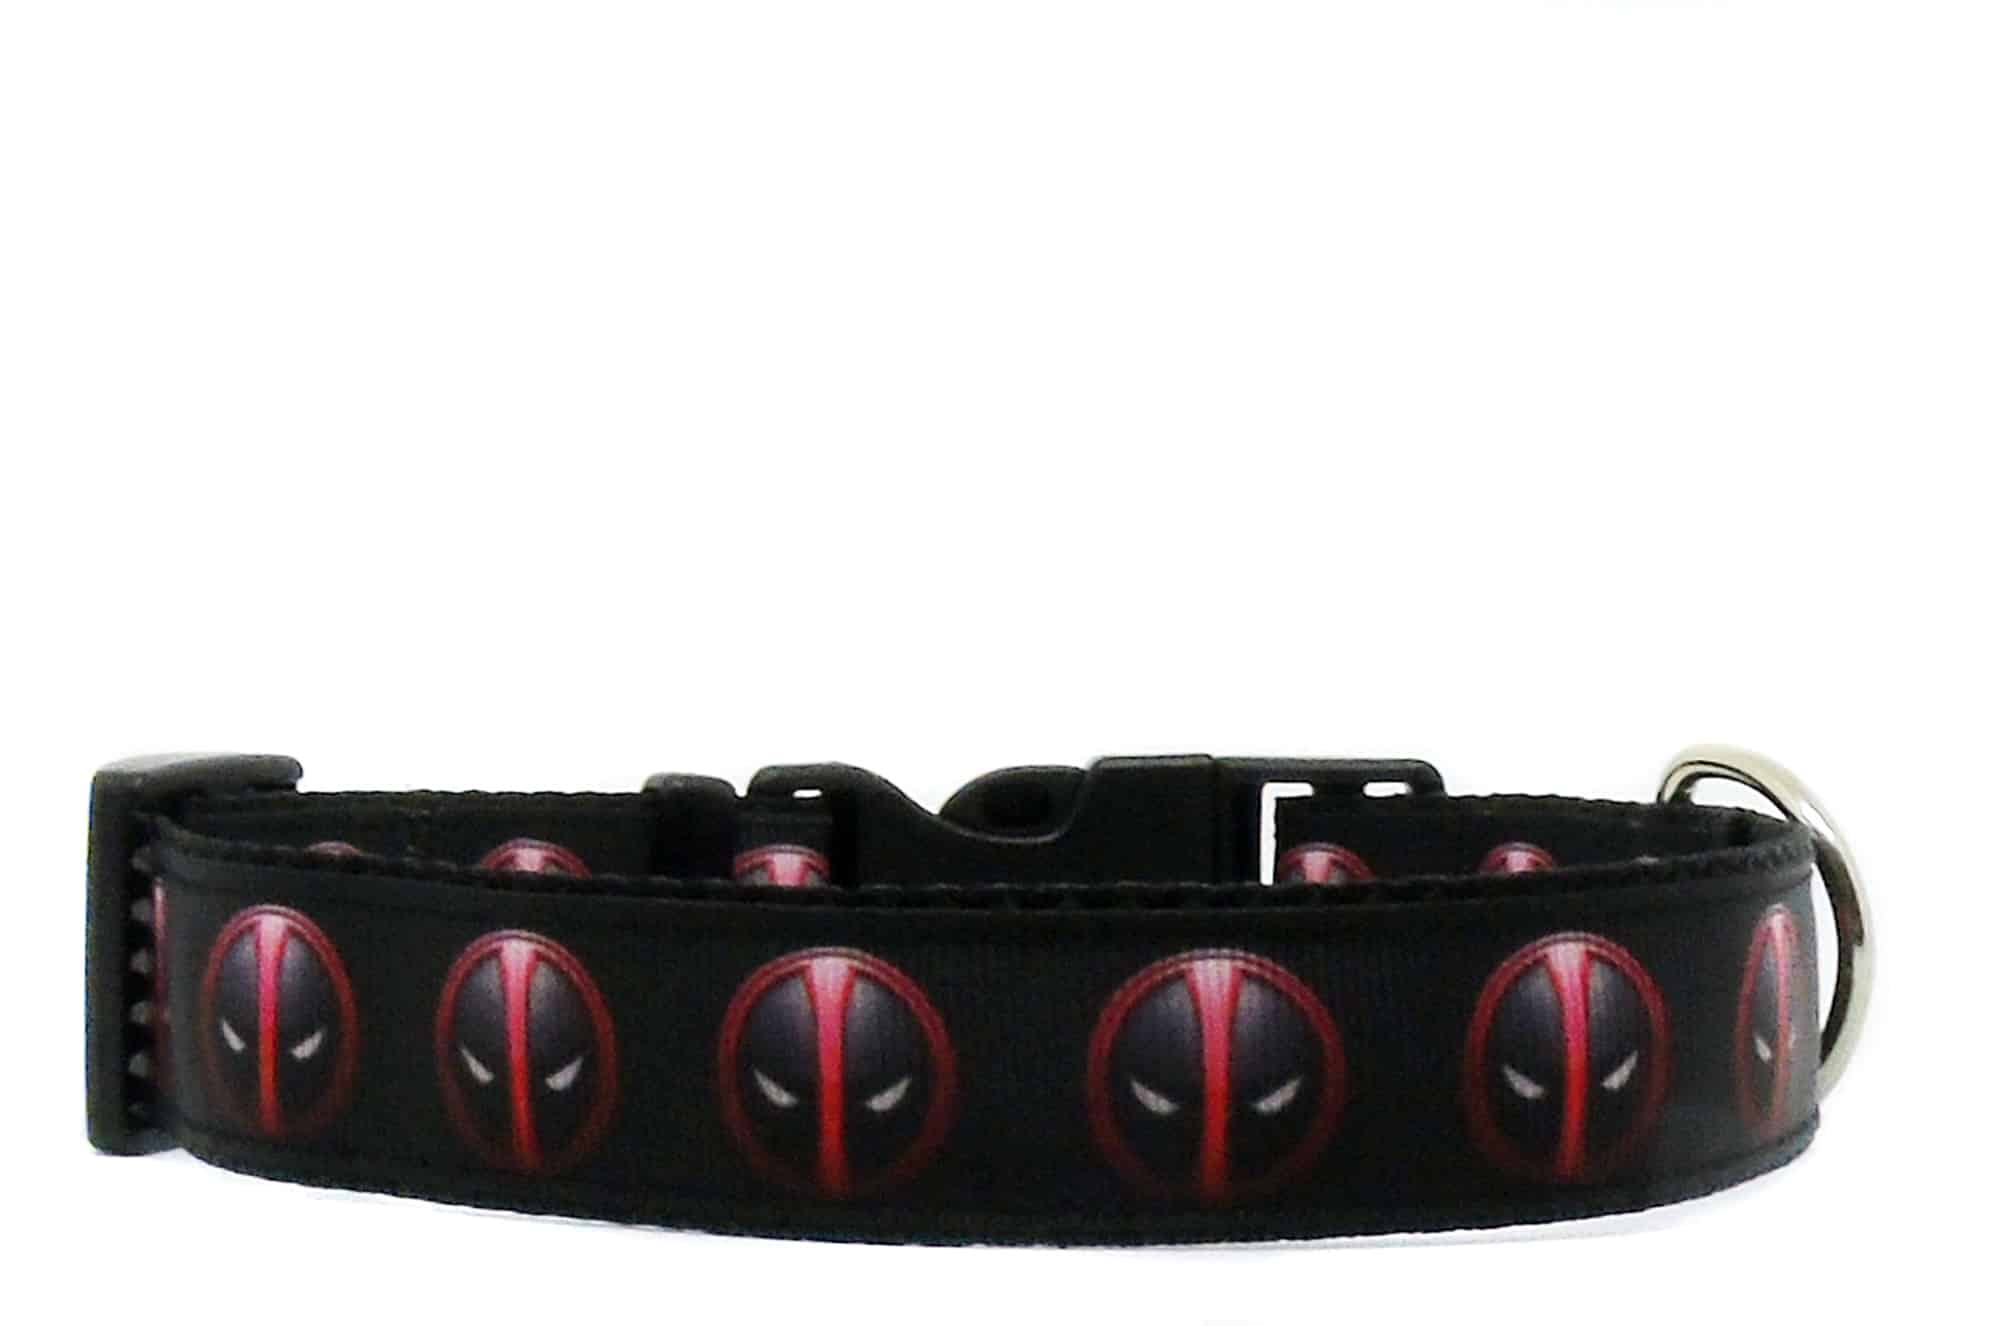 deadpool collar